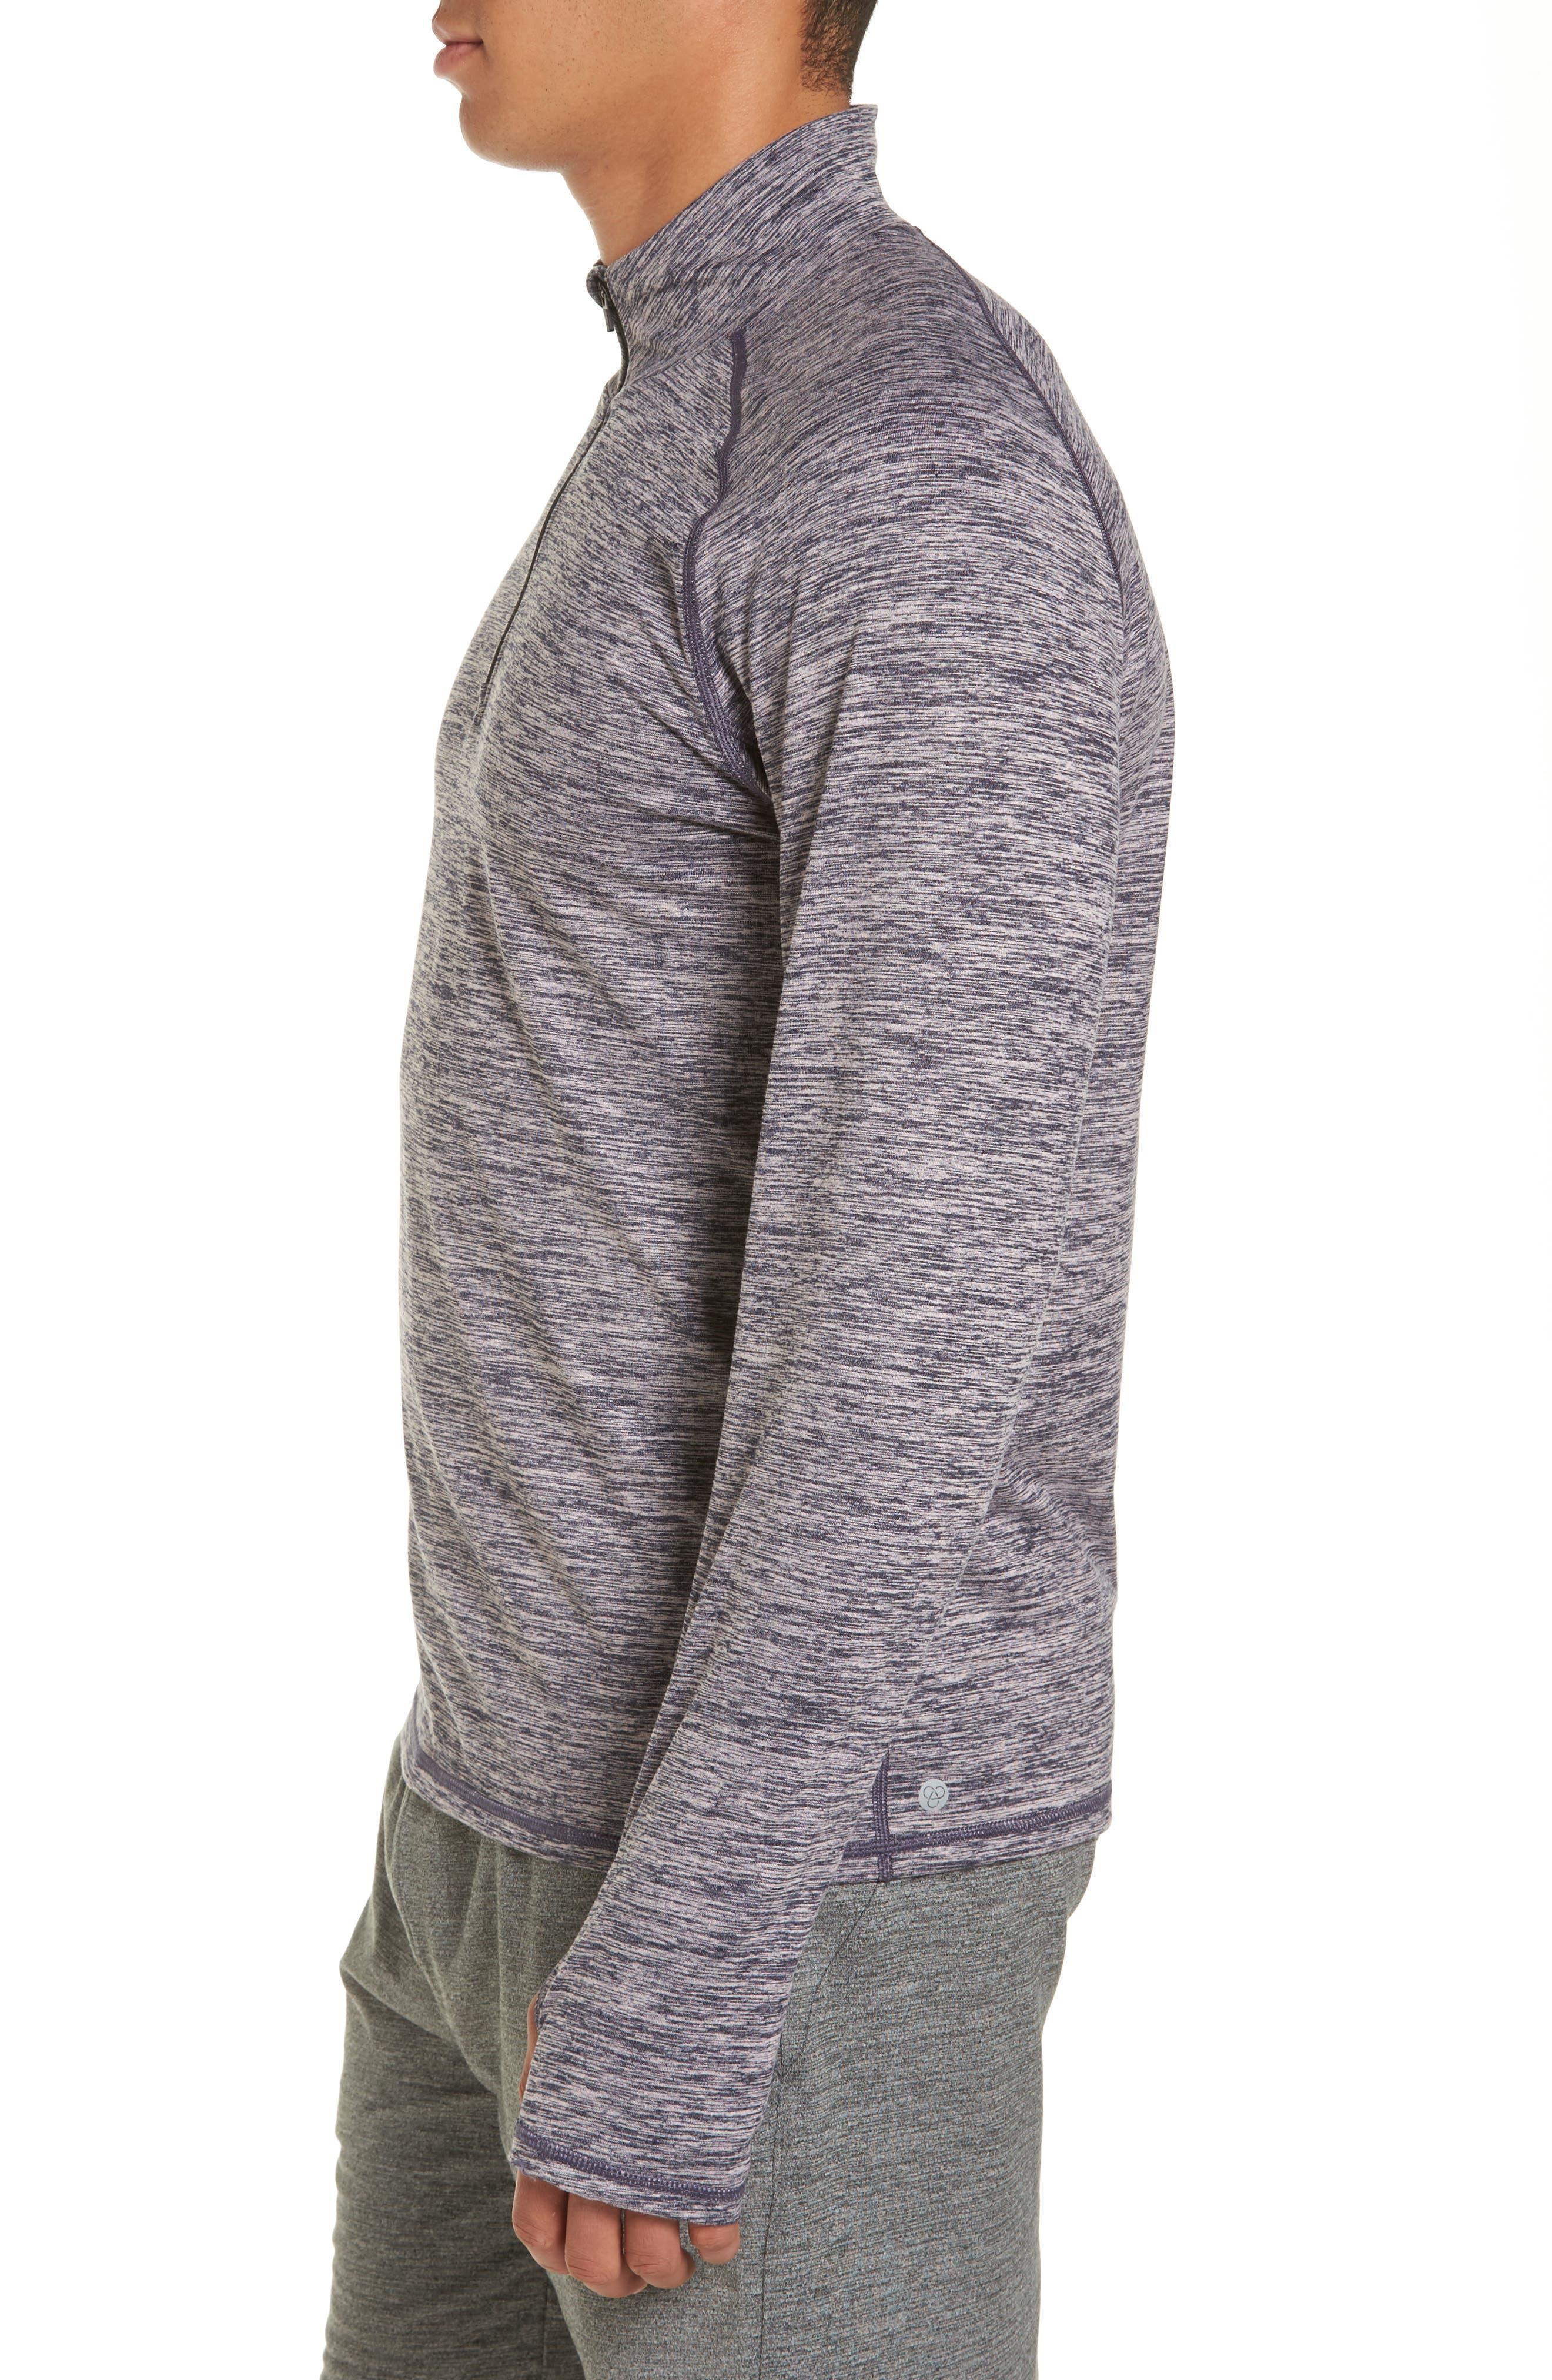 Celsian Quarter Zip Pullover,                             Alternate thumbnail 3, color,                             Purple Navy Melange